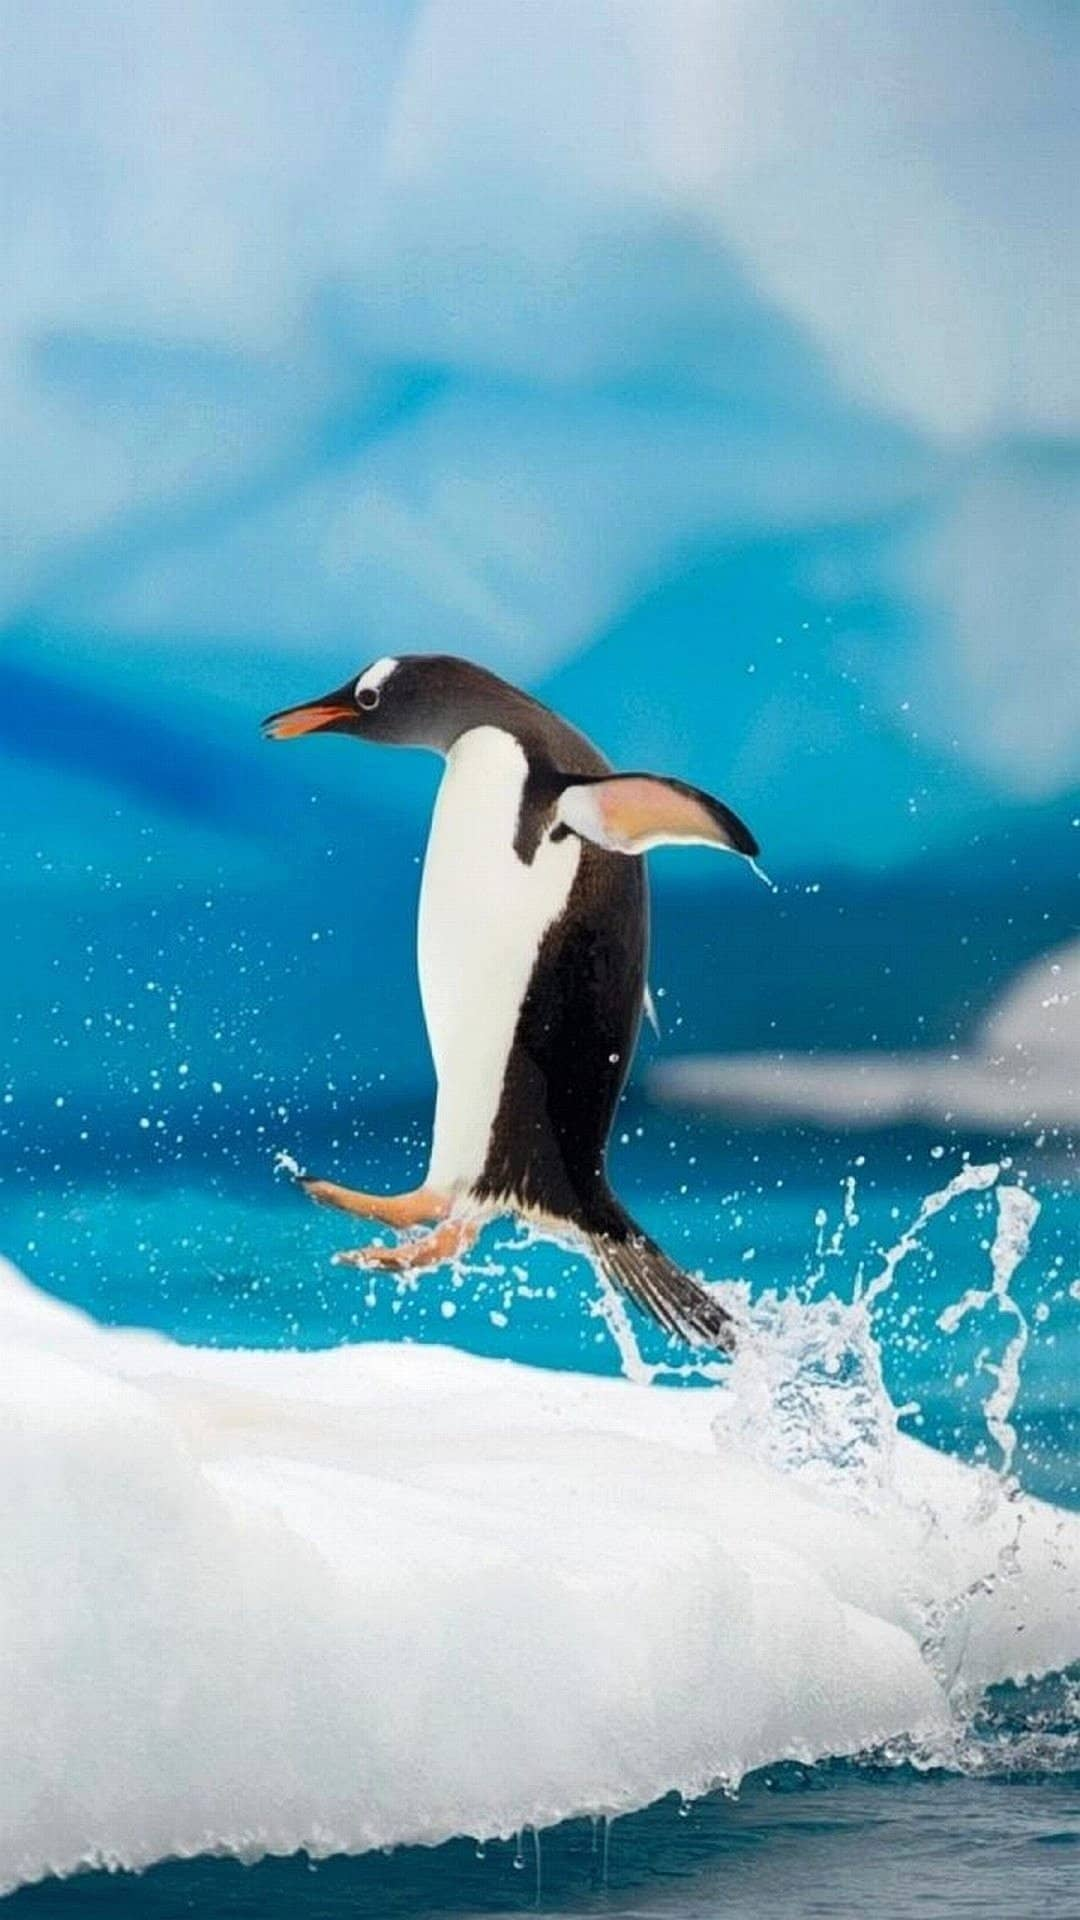 Wallpaper Iphone 7 Pinguin   Penguin Wallpaper Iphone 176840 1080x1920